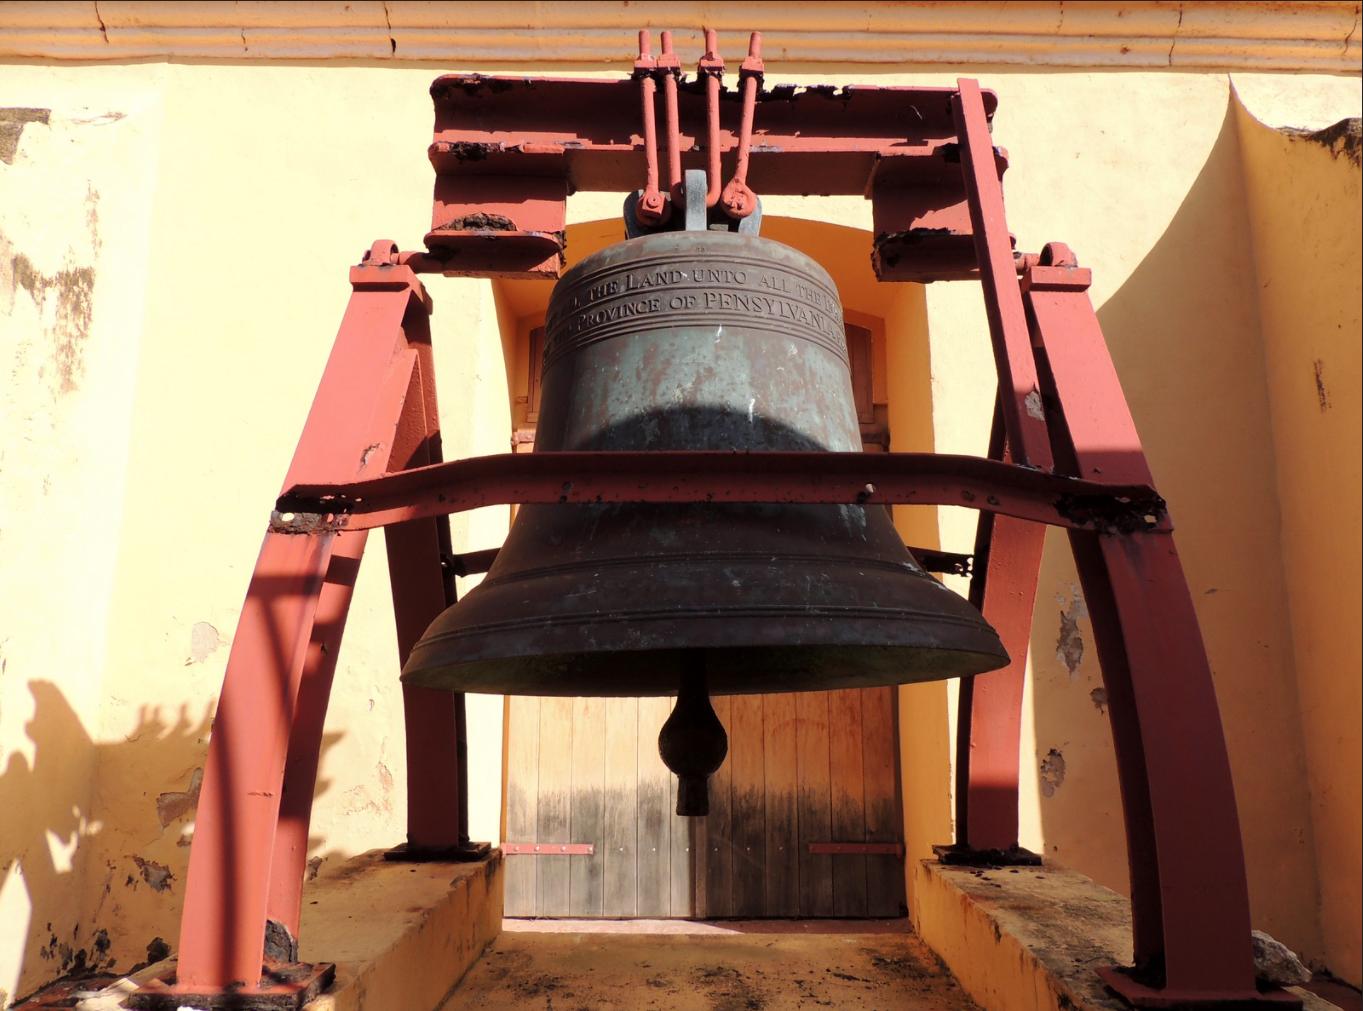 Puerto Rico Liberty Bell replica